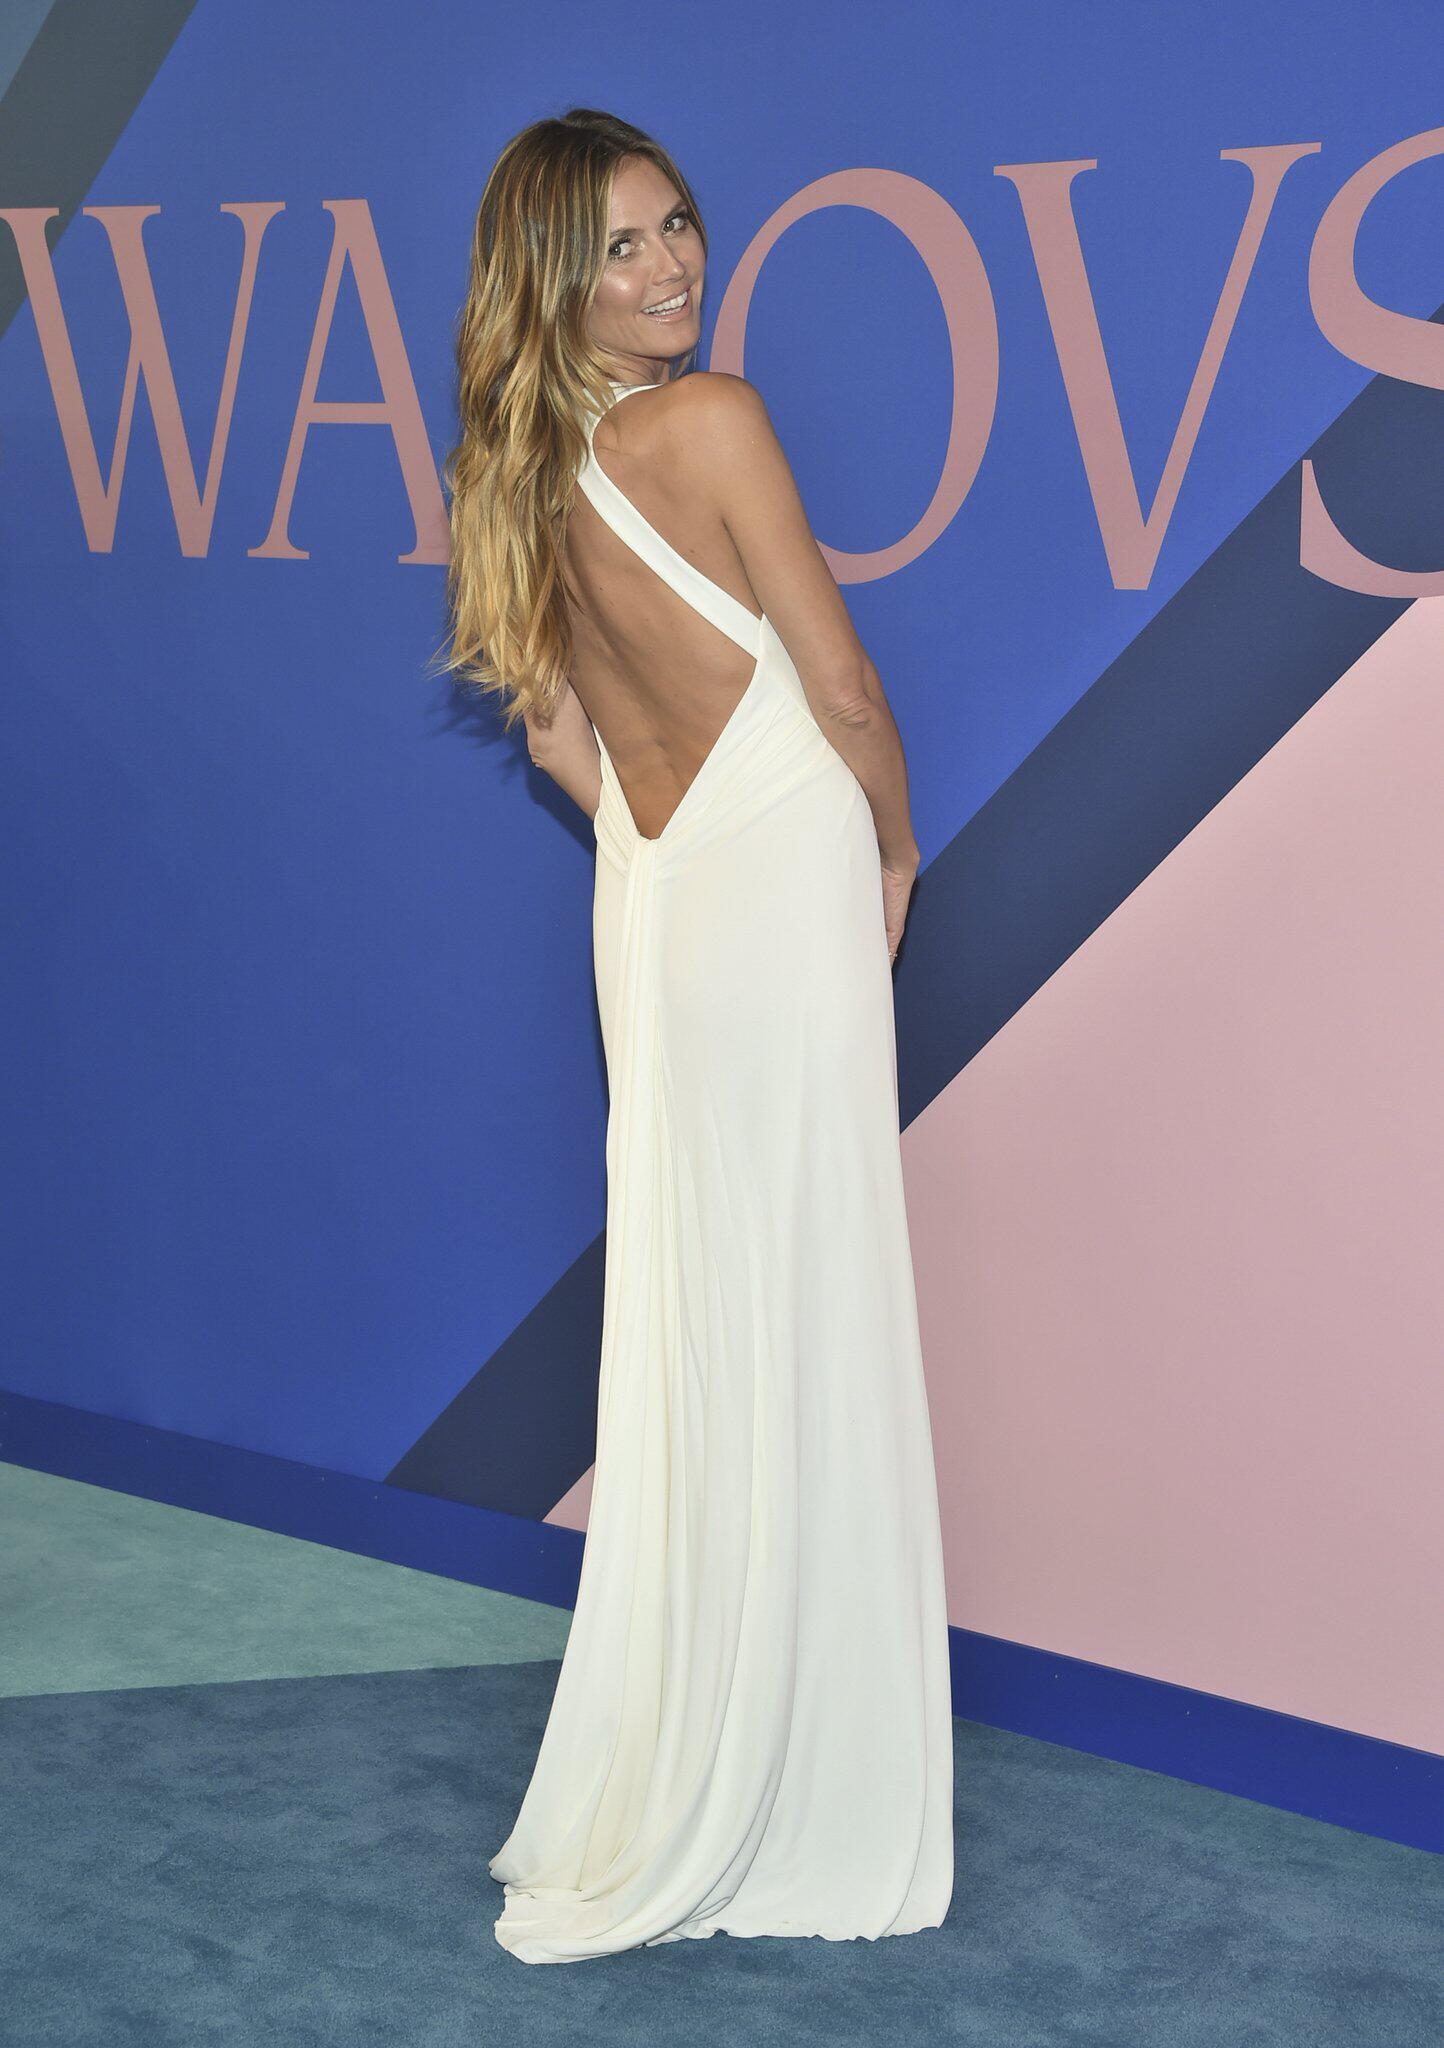 Bild zu CFDA Fashion Awards - Heidi Klum